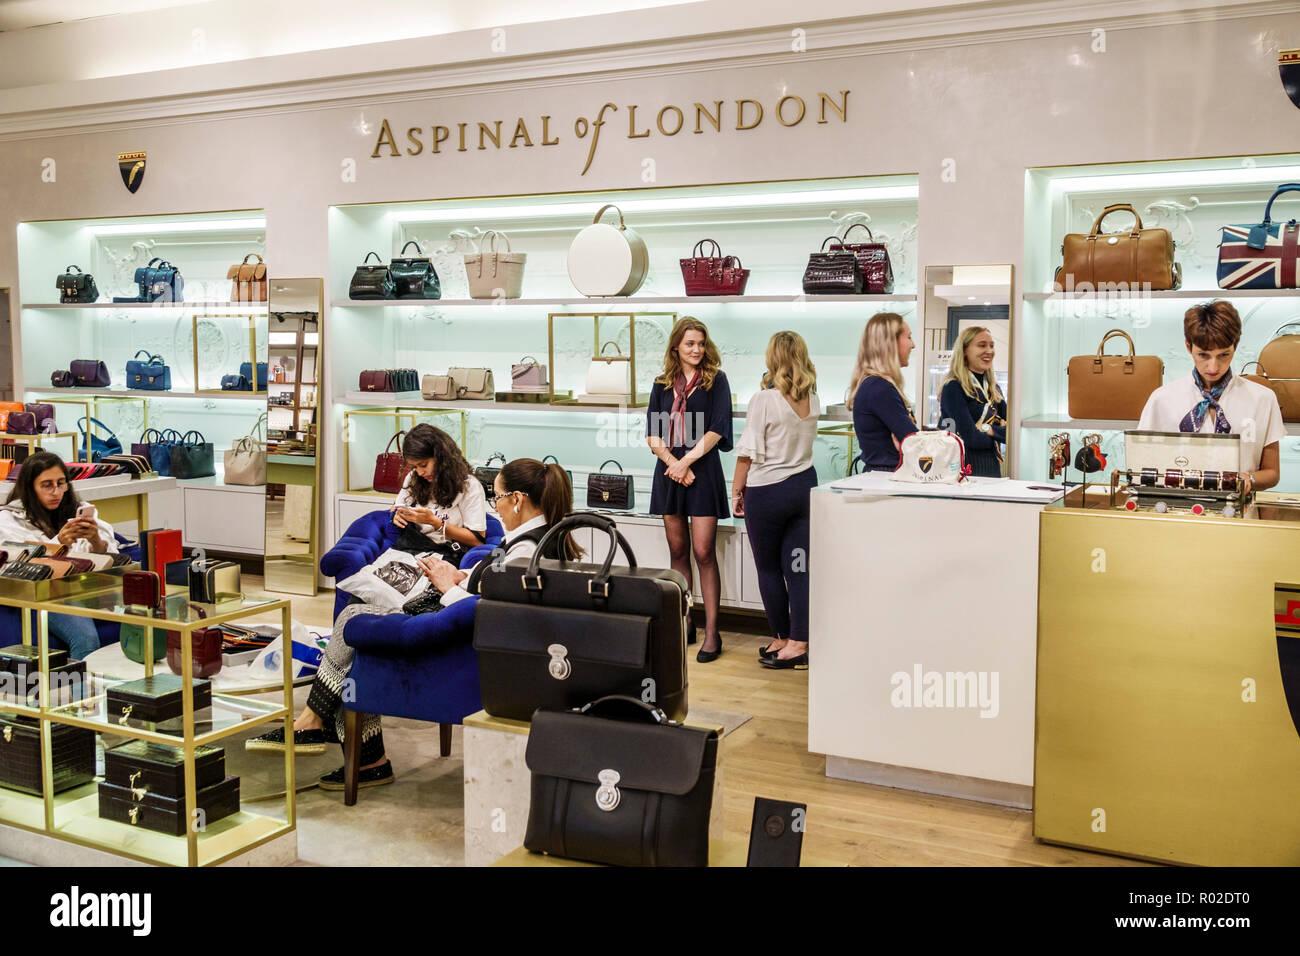 39502f601956 London England United Kingdom Great Britain Marylebone Selfridges  Department Store shopping inside interior upmarket luxury retail display  sale design